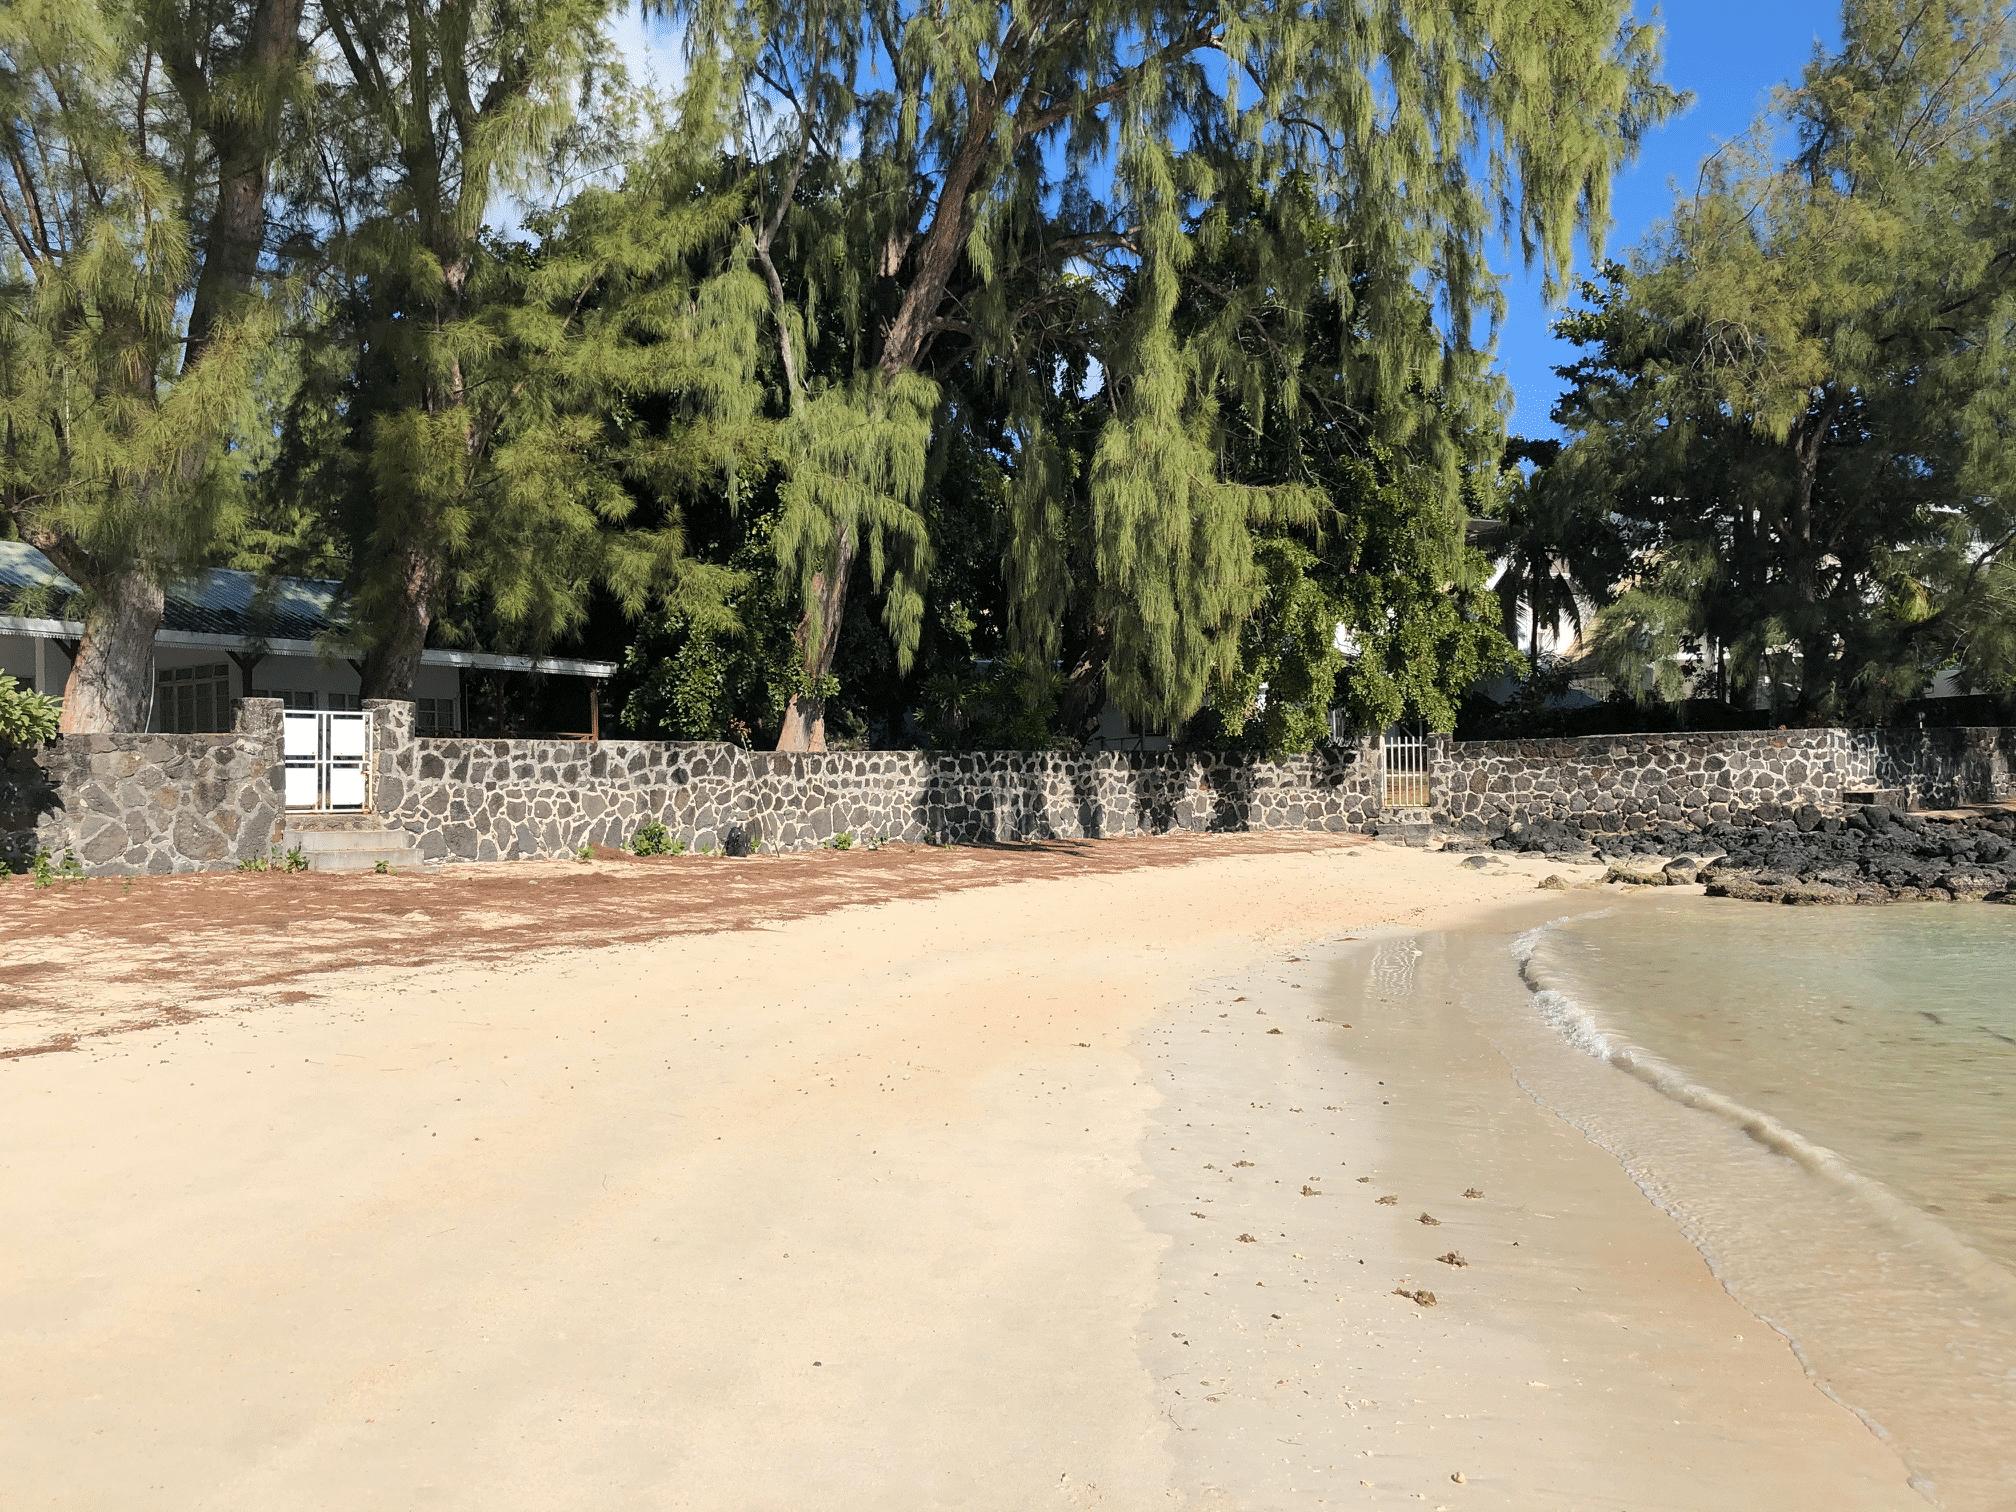 Péreybère plage - immobilier ile maurice